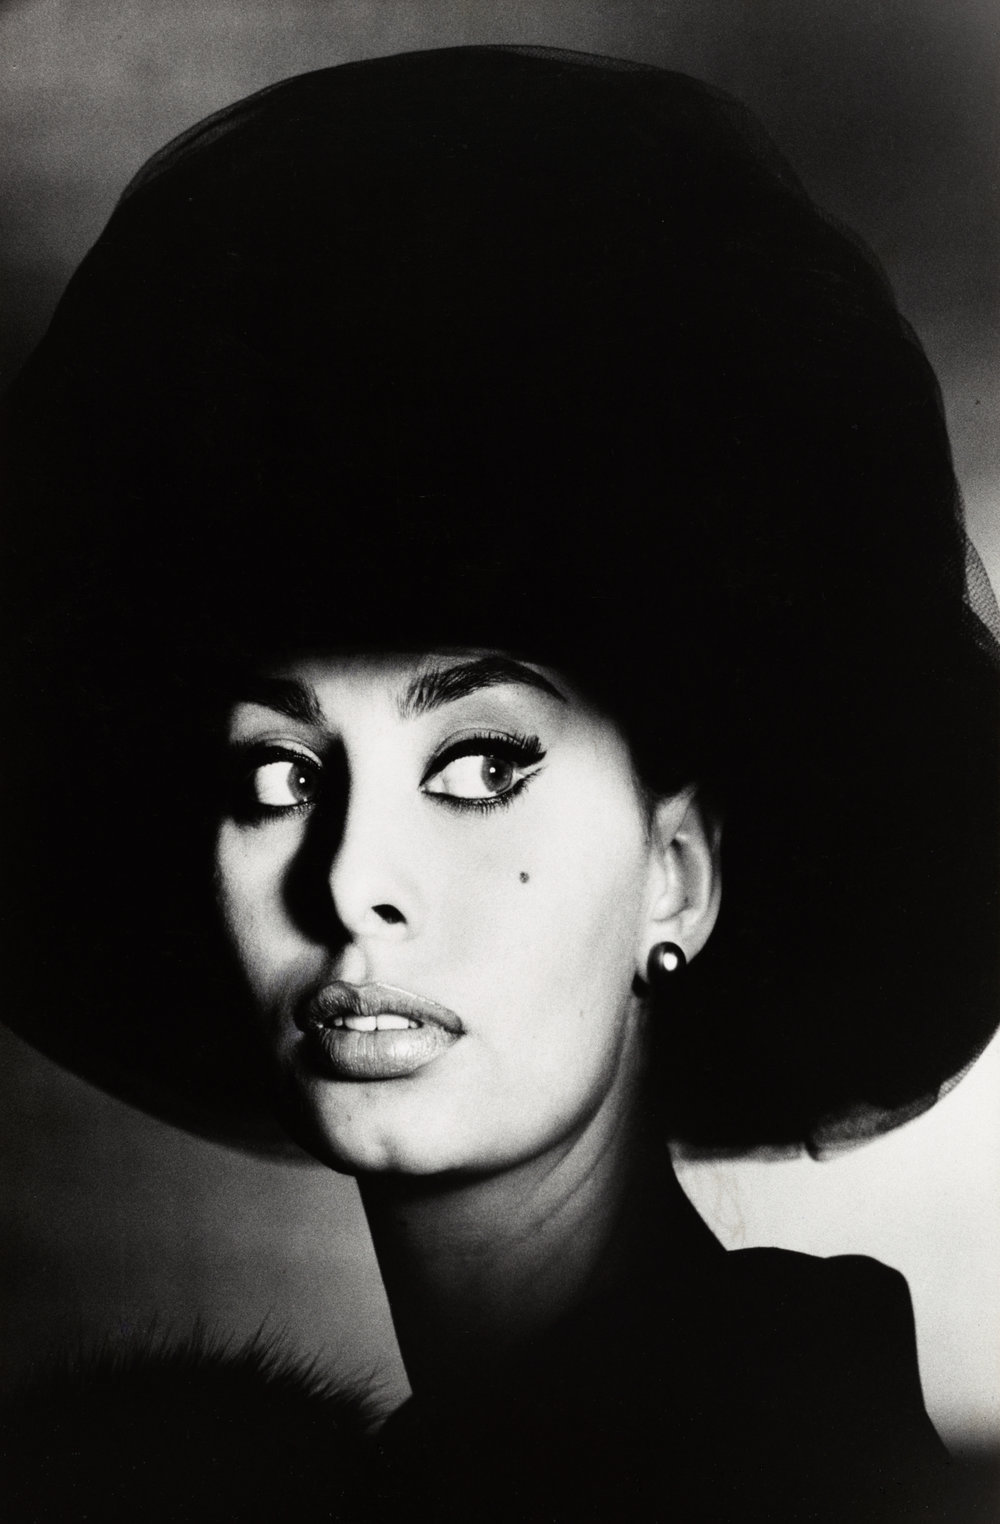 Sophia Loren , New York, 1959 Gelatin silver print © Condé Nast